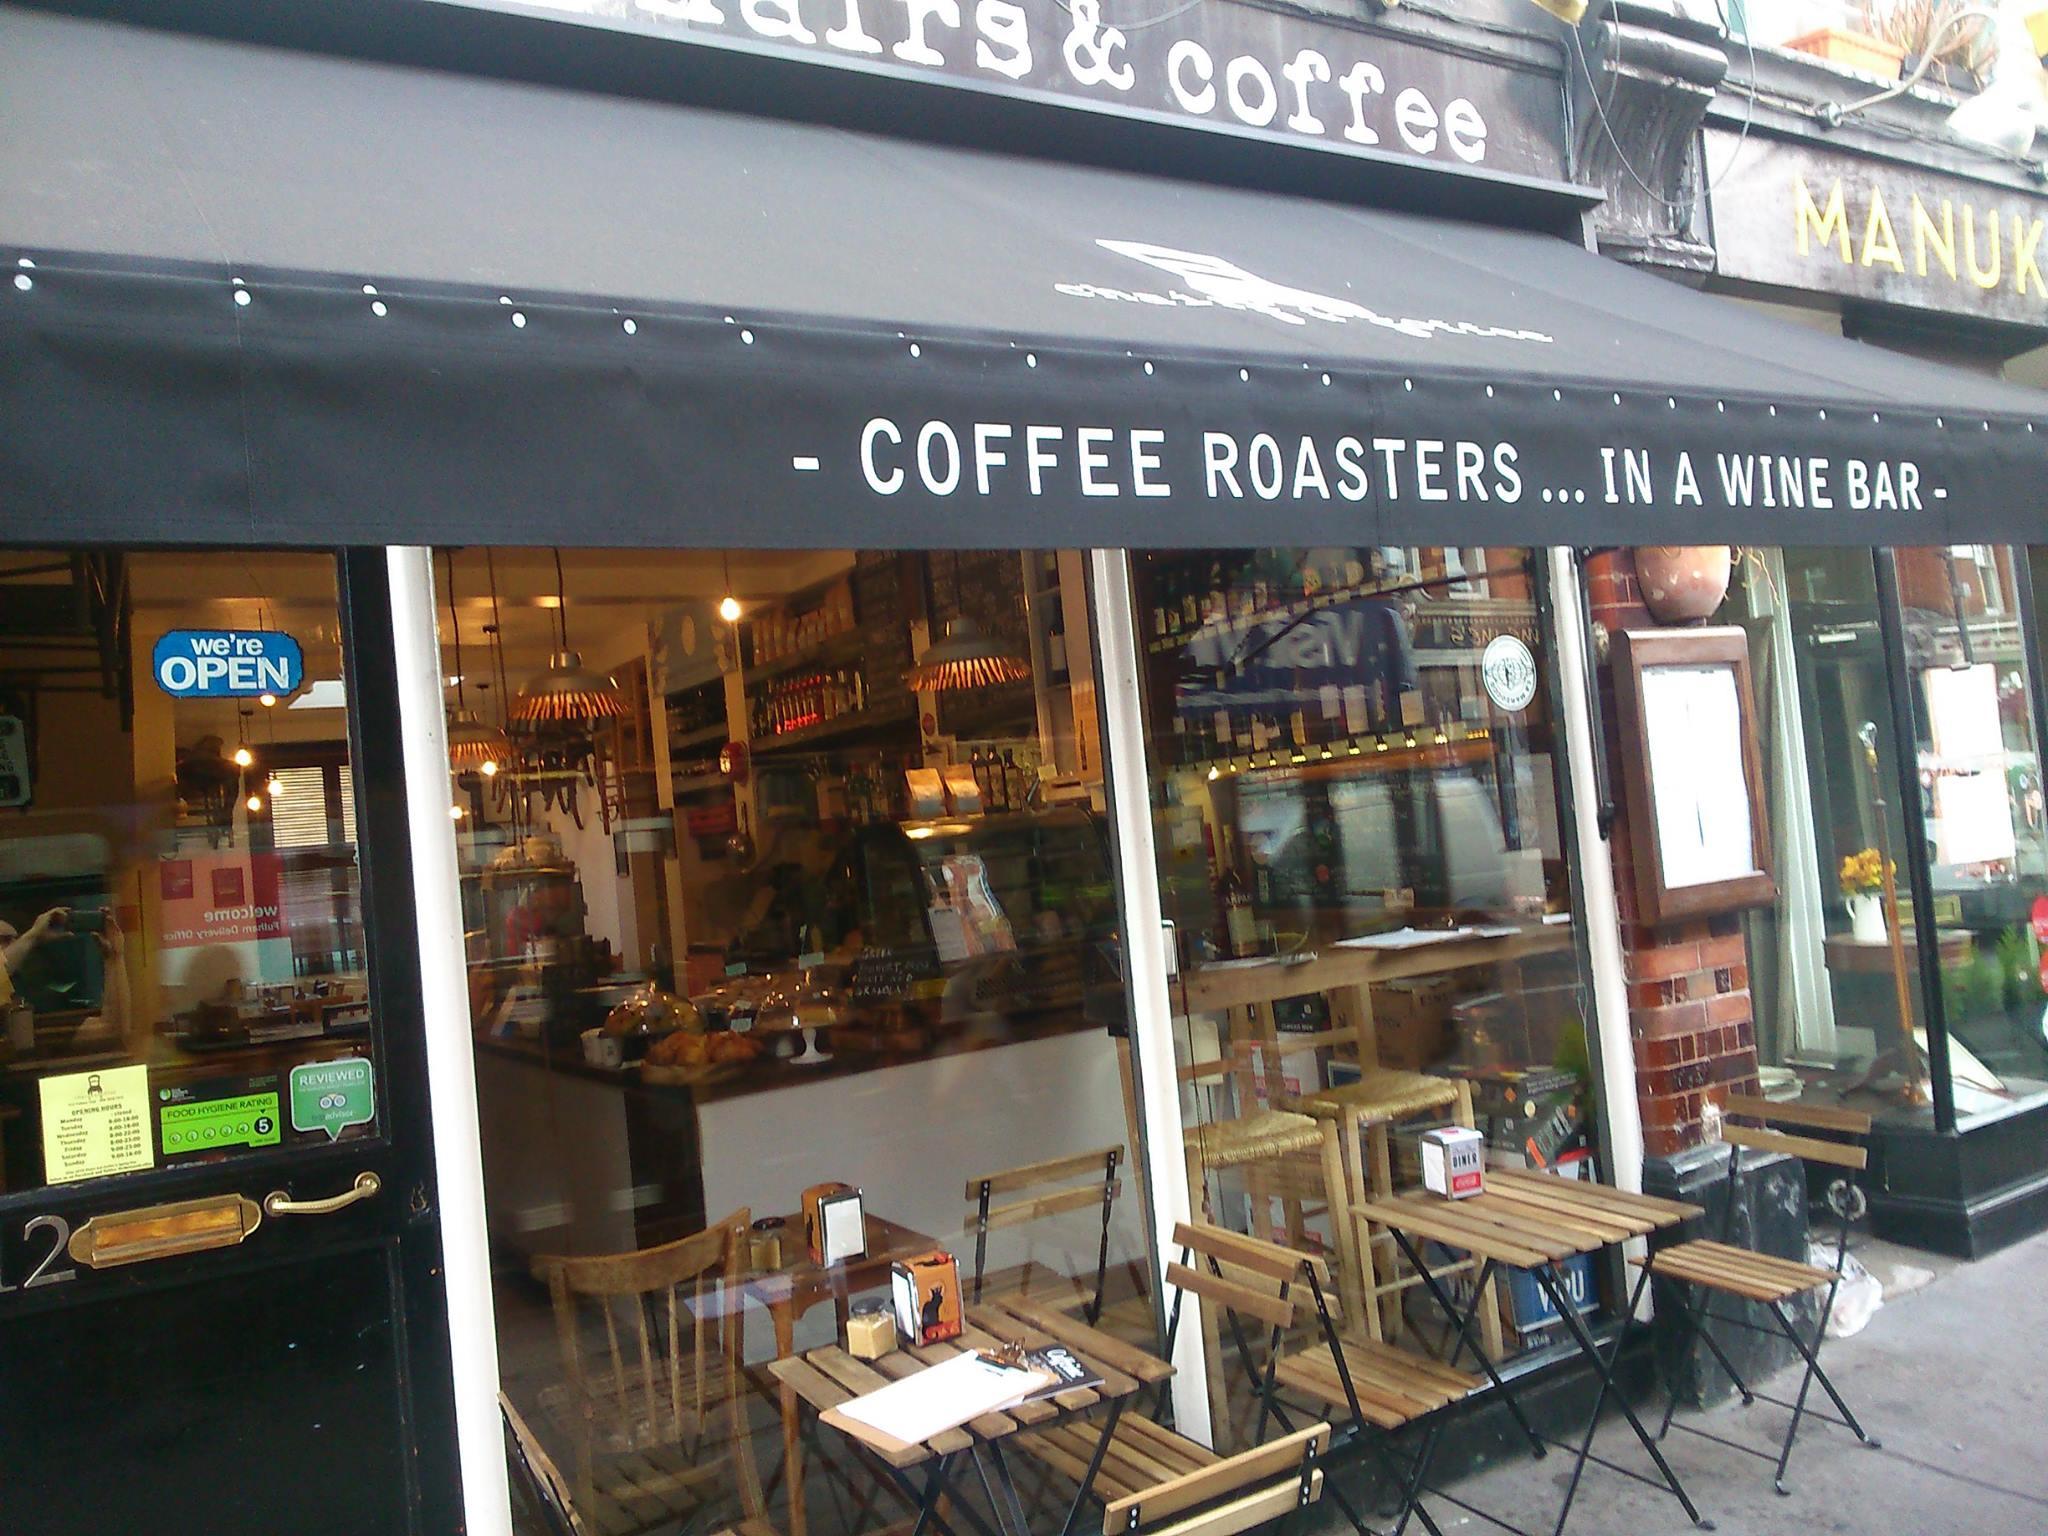 London's historic coffee